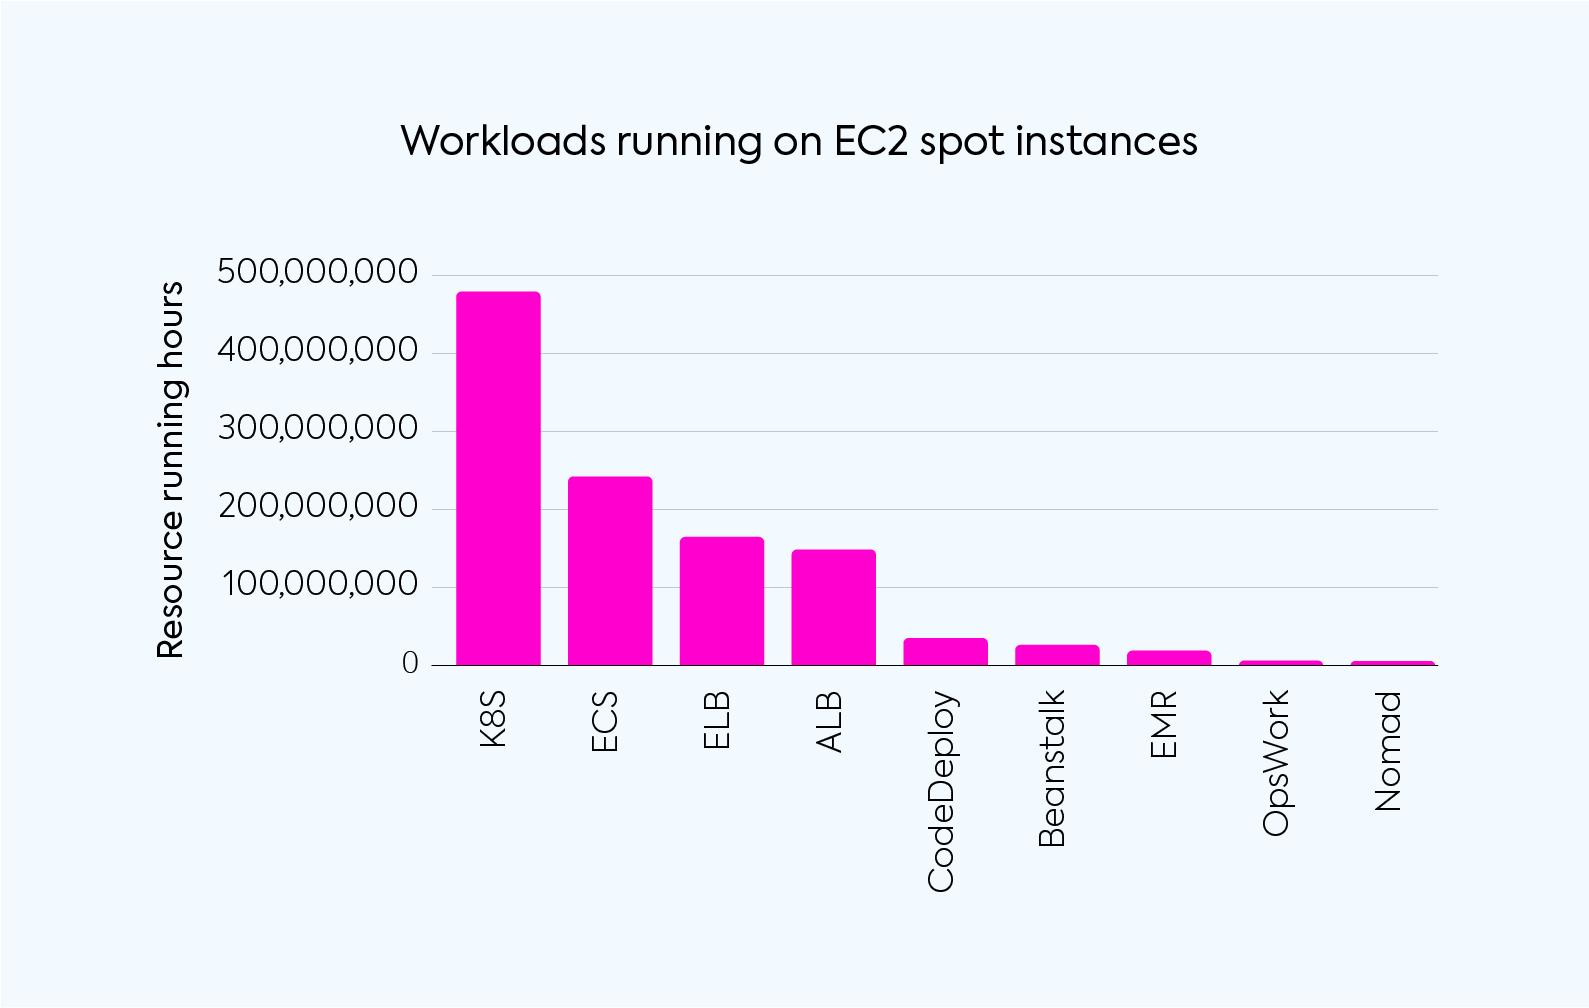 Graph of AWS EC2 Spot Instances Workloads